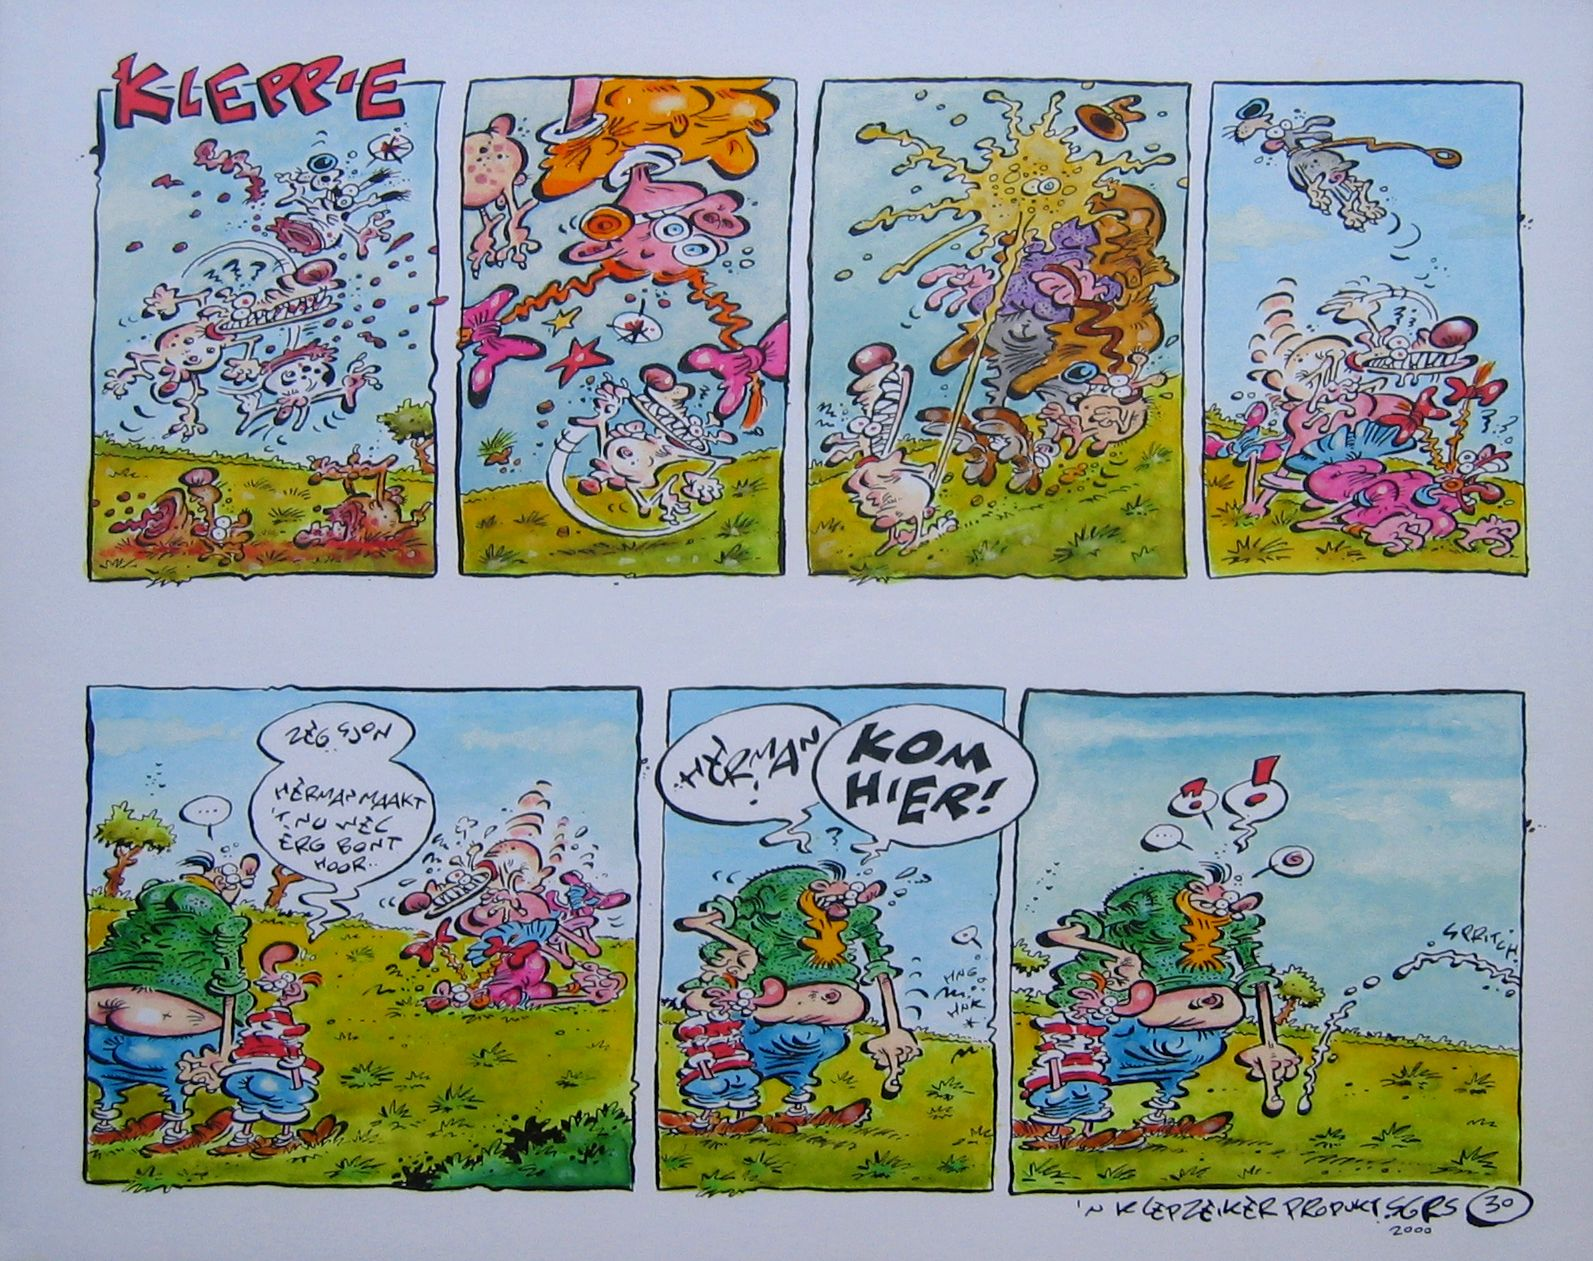 Kom-hier-gr-originele-striptekening-Klep